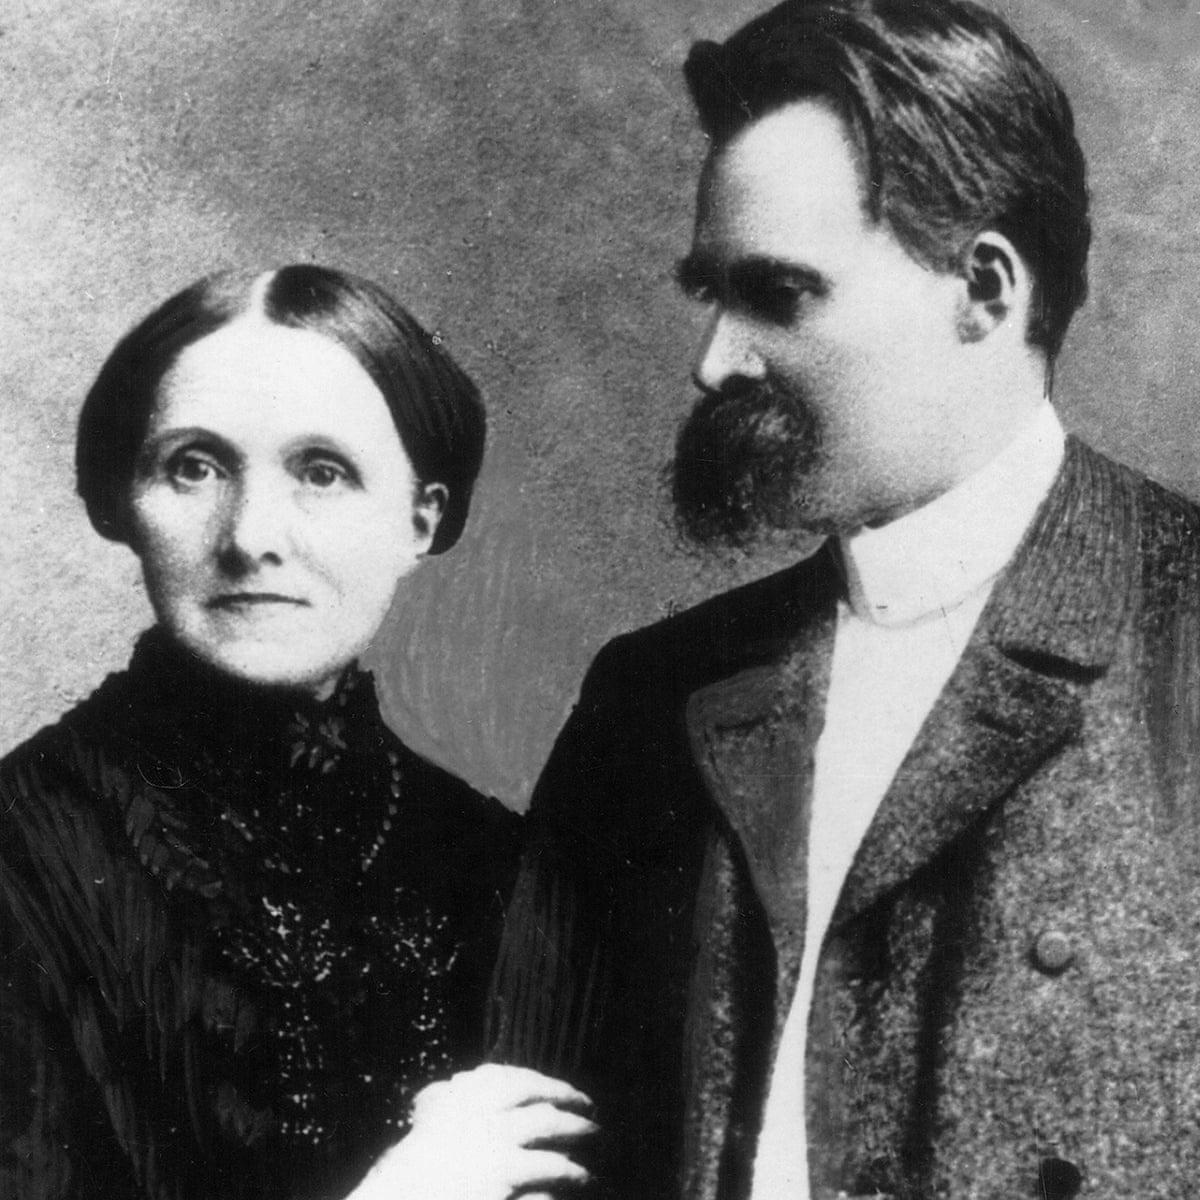 Far right, misogynist, humourless? Why Nietzsche is misunderstood | Books |  The Guardian